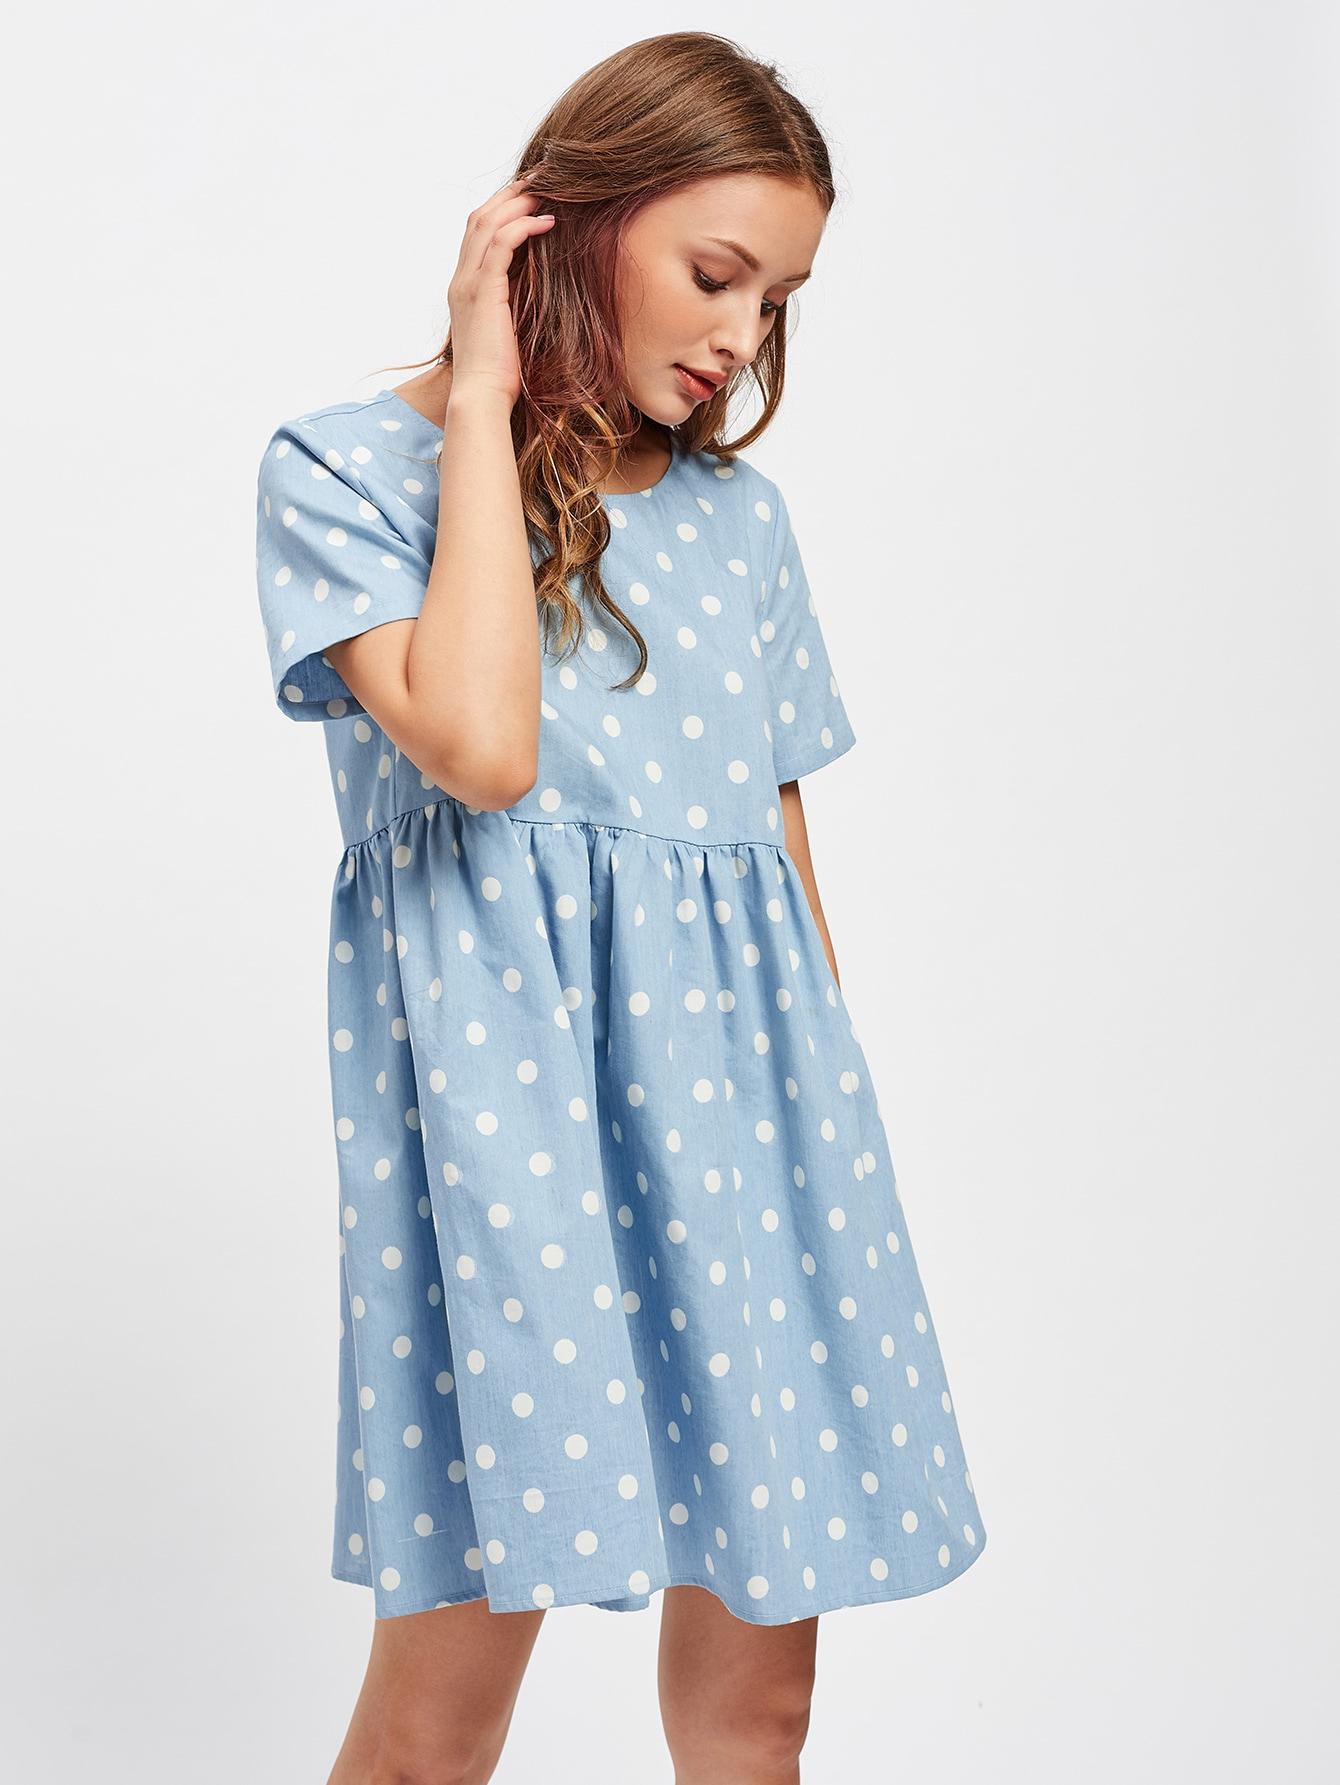 Polka Dot Print Smock Dress